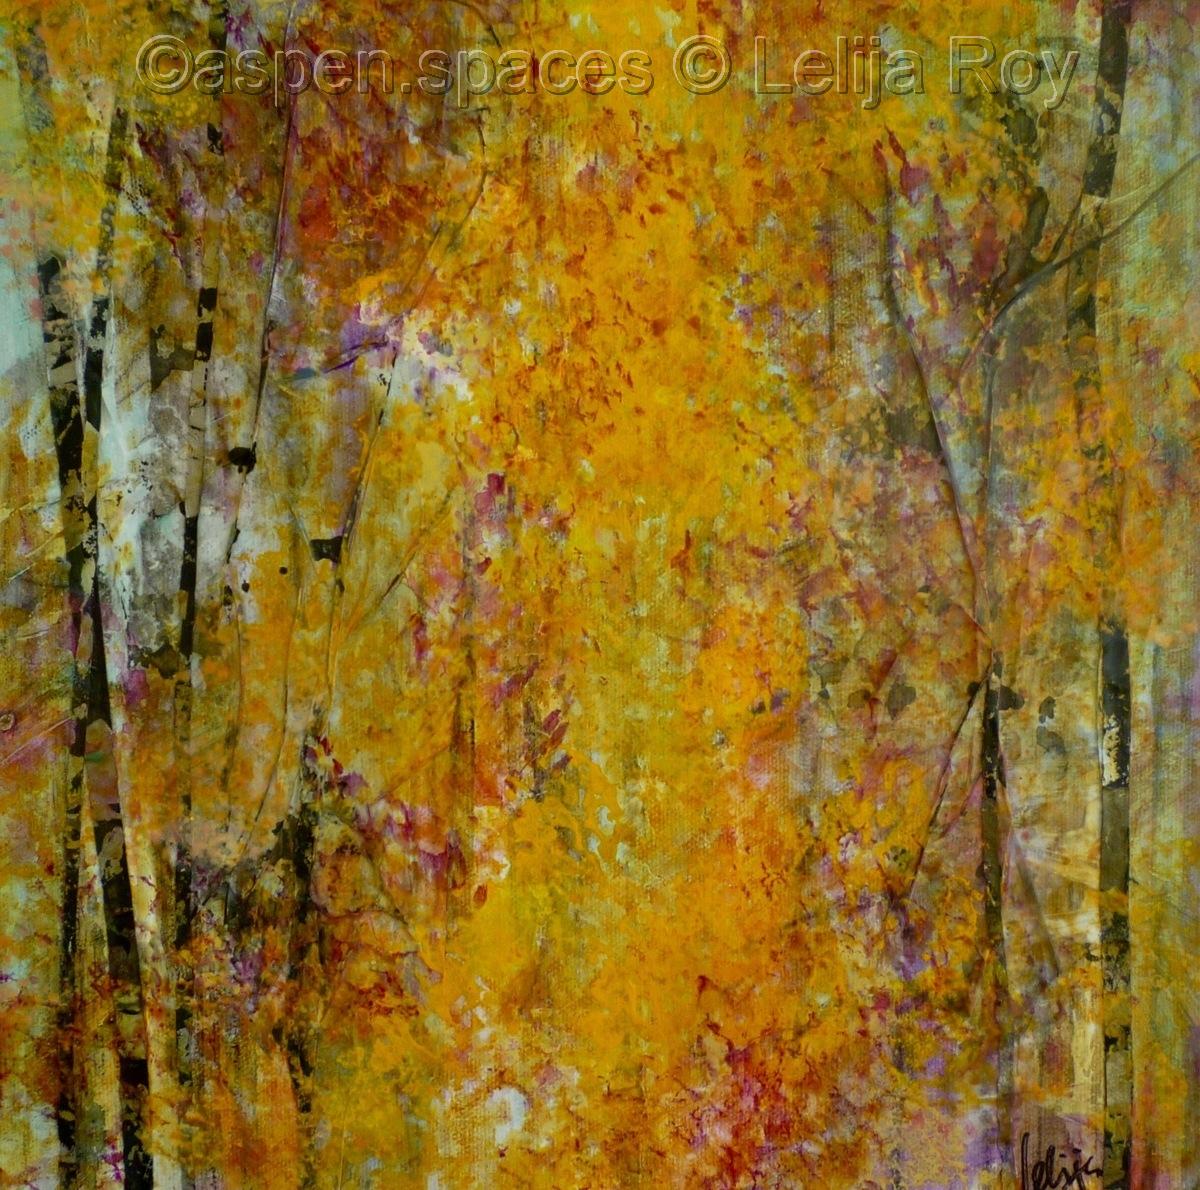 Golden Confetti 12x12 (large view)